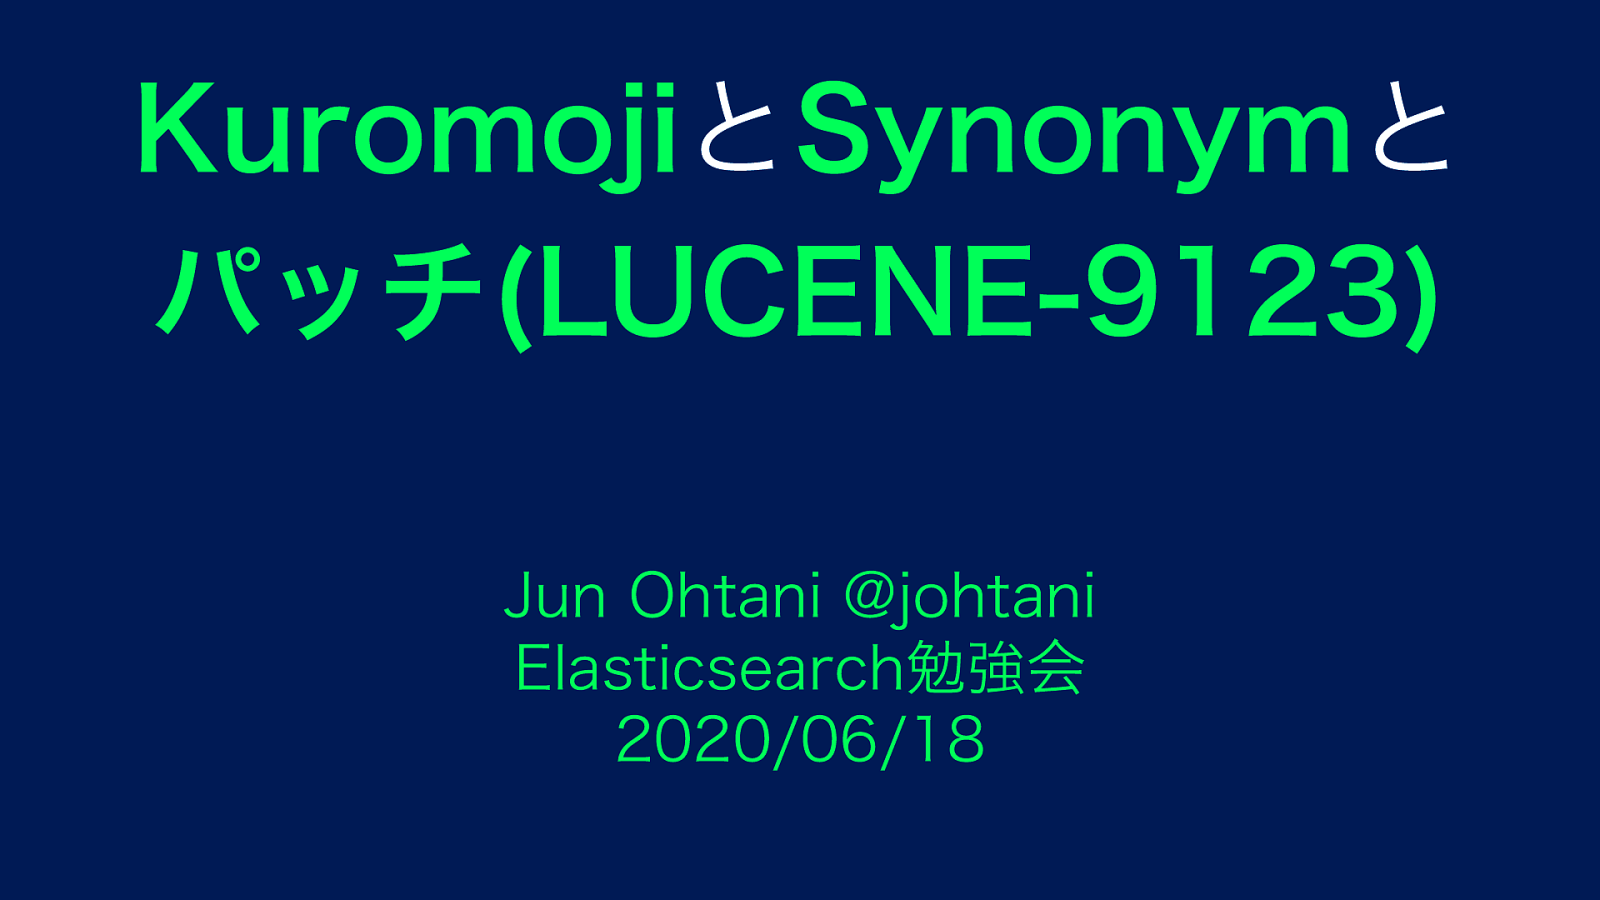 KuromojiとSynonymとパッチ(LUCENE-9123)